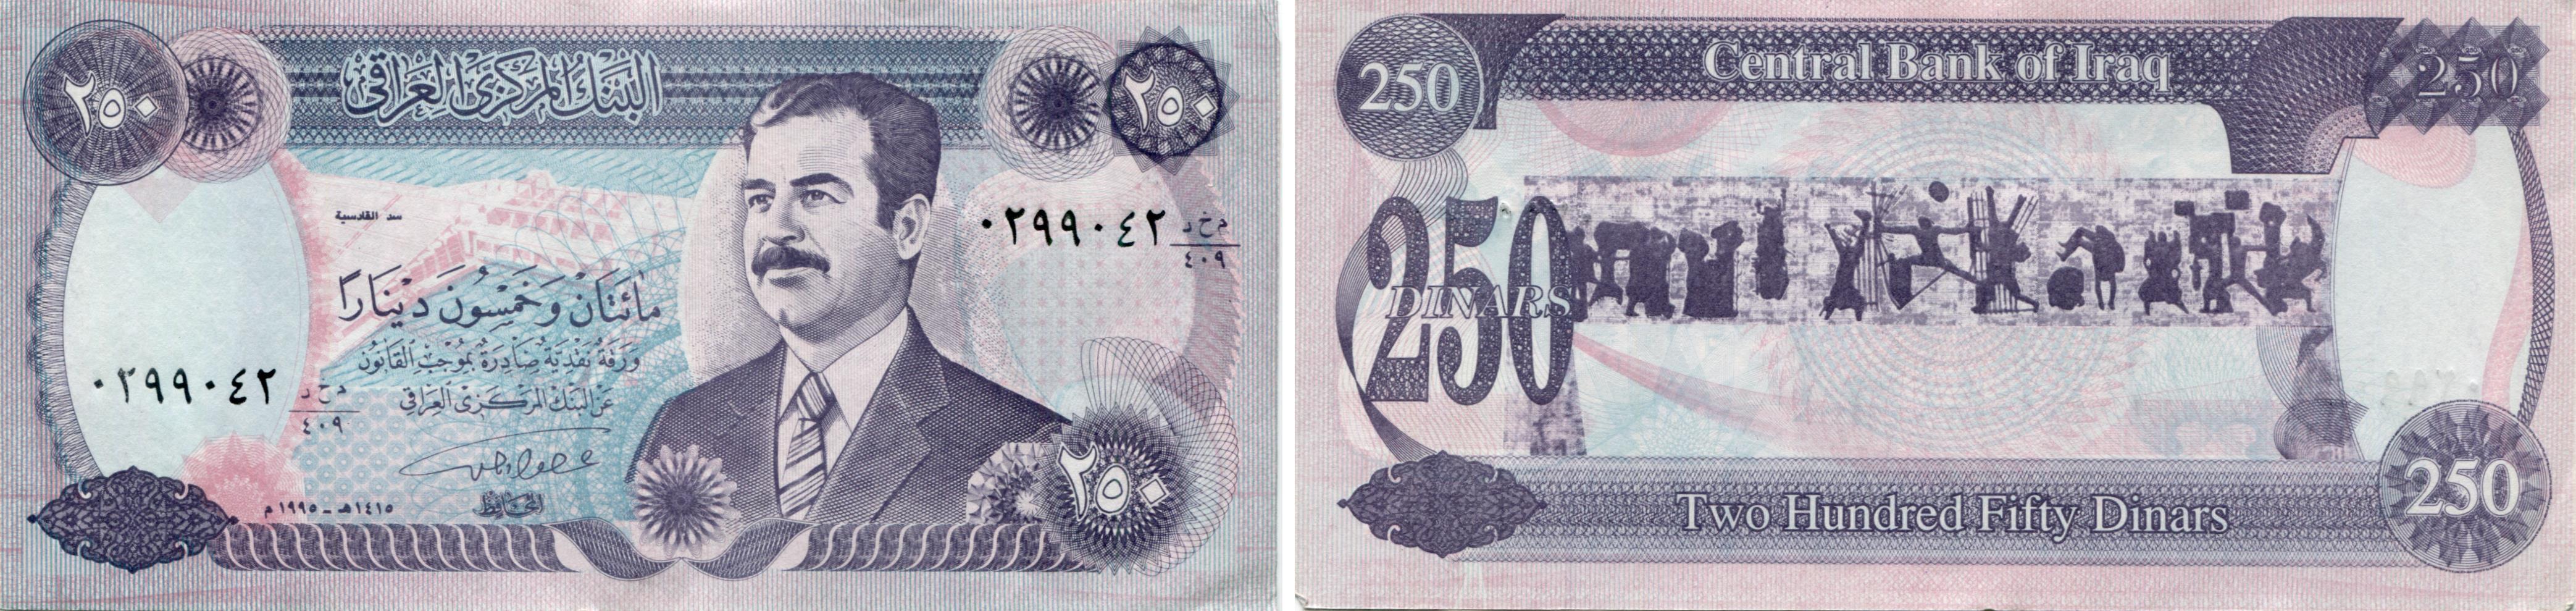 Iraq 205 Dinar Note 1995 P85